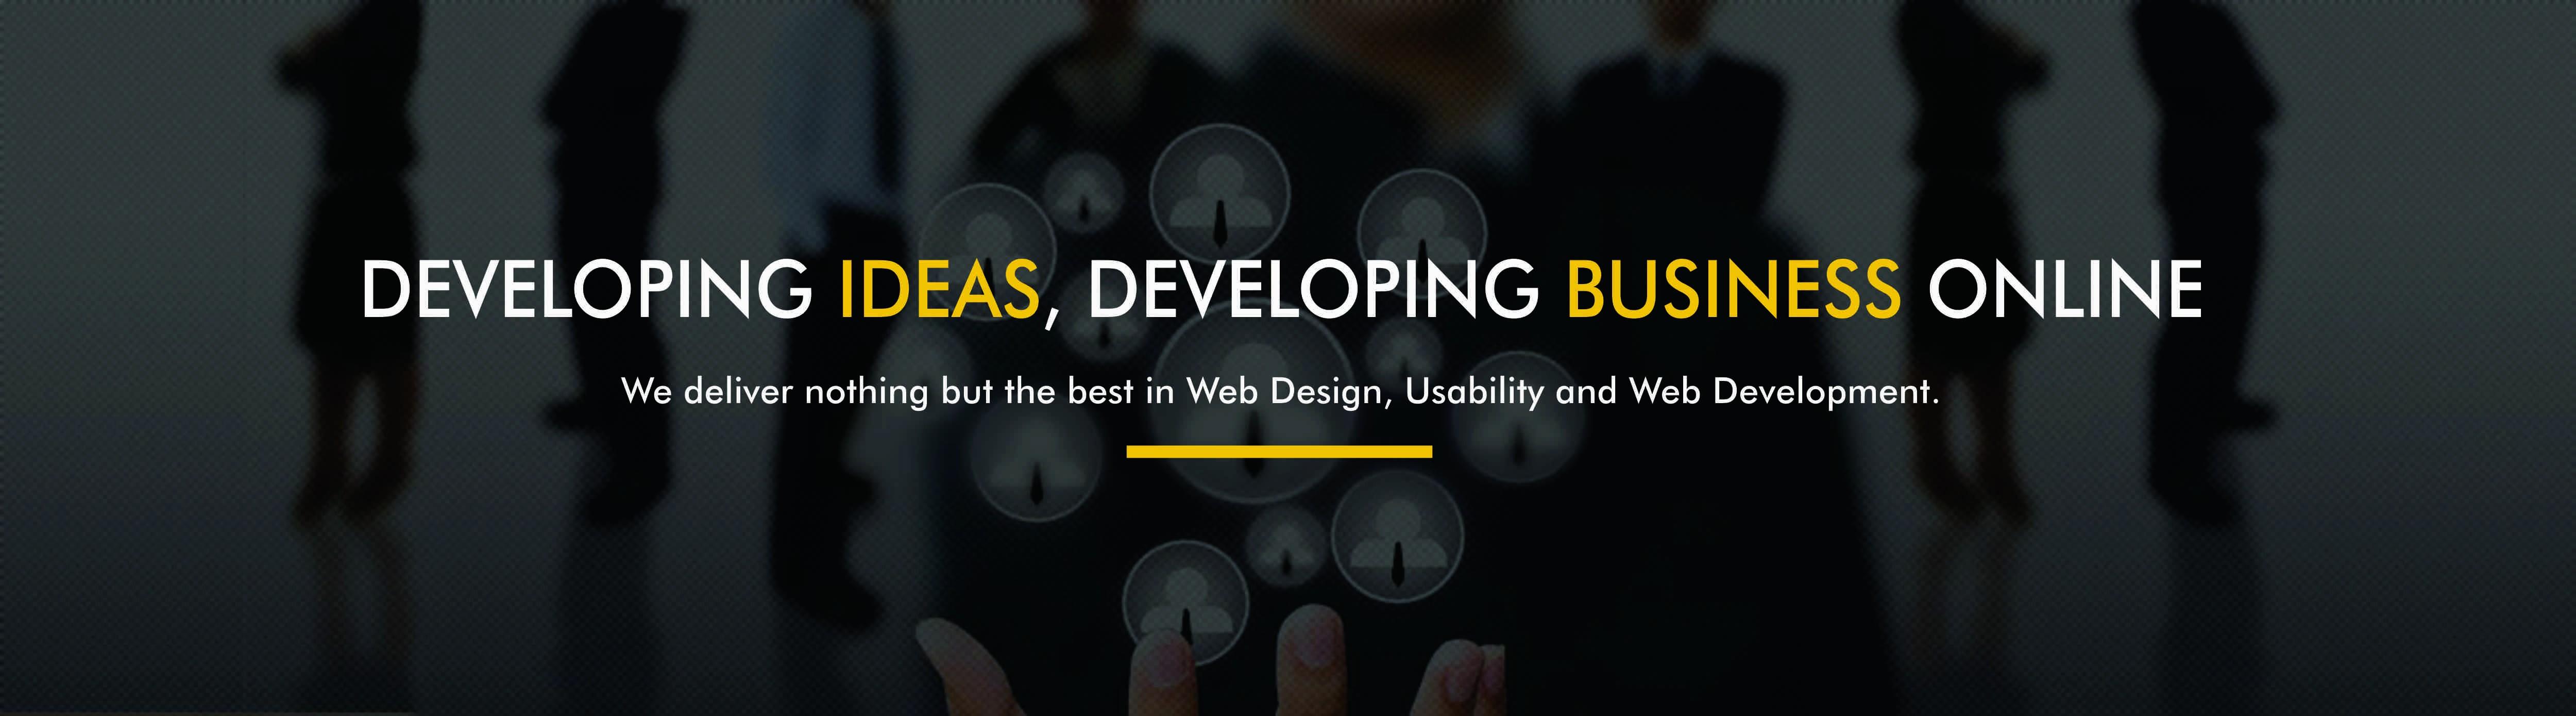 Web Designing, Web Development & SEO Company In London UK